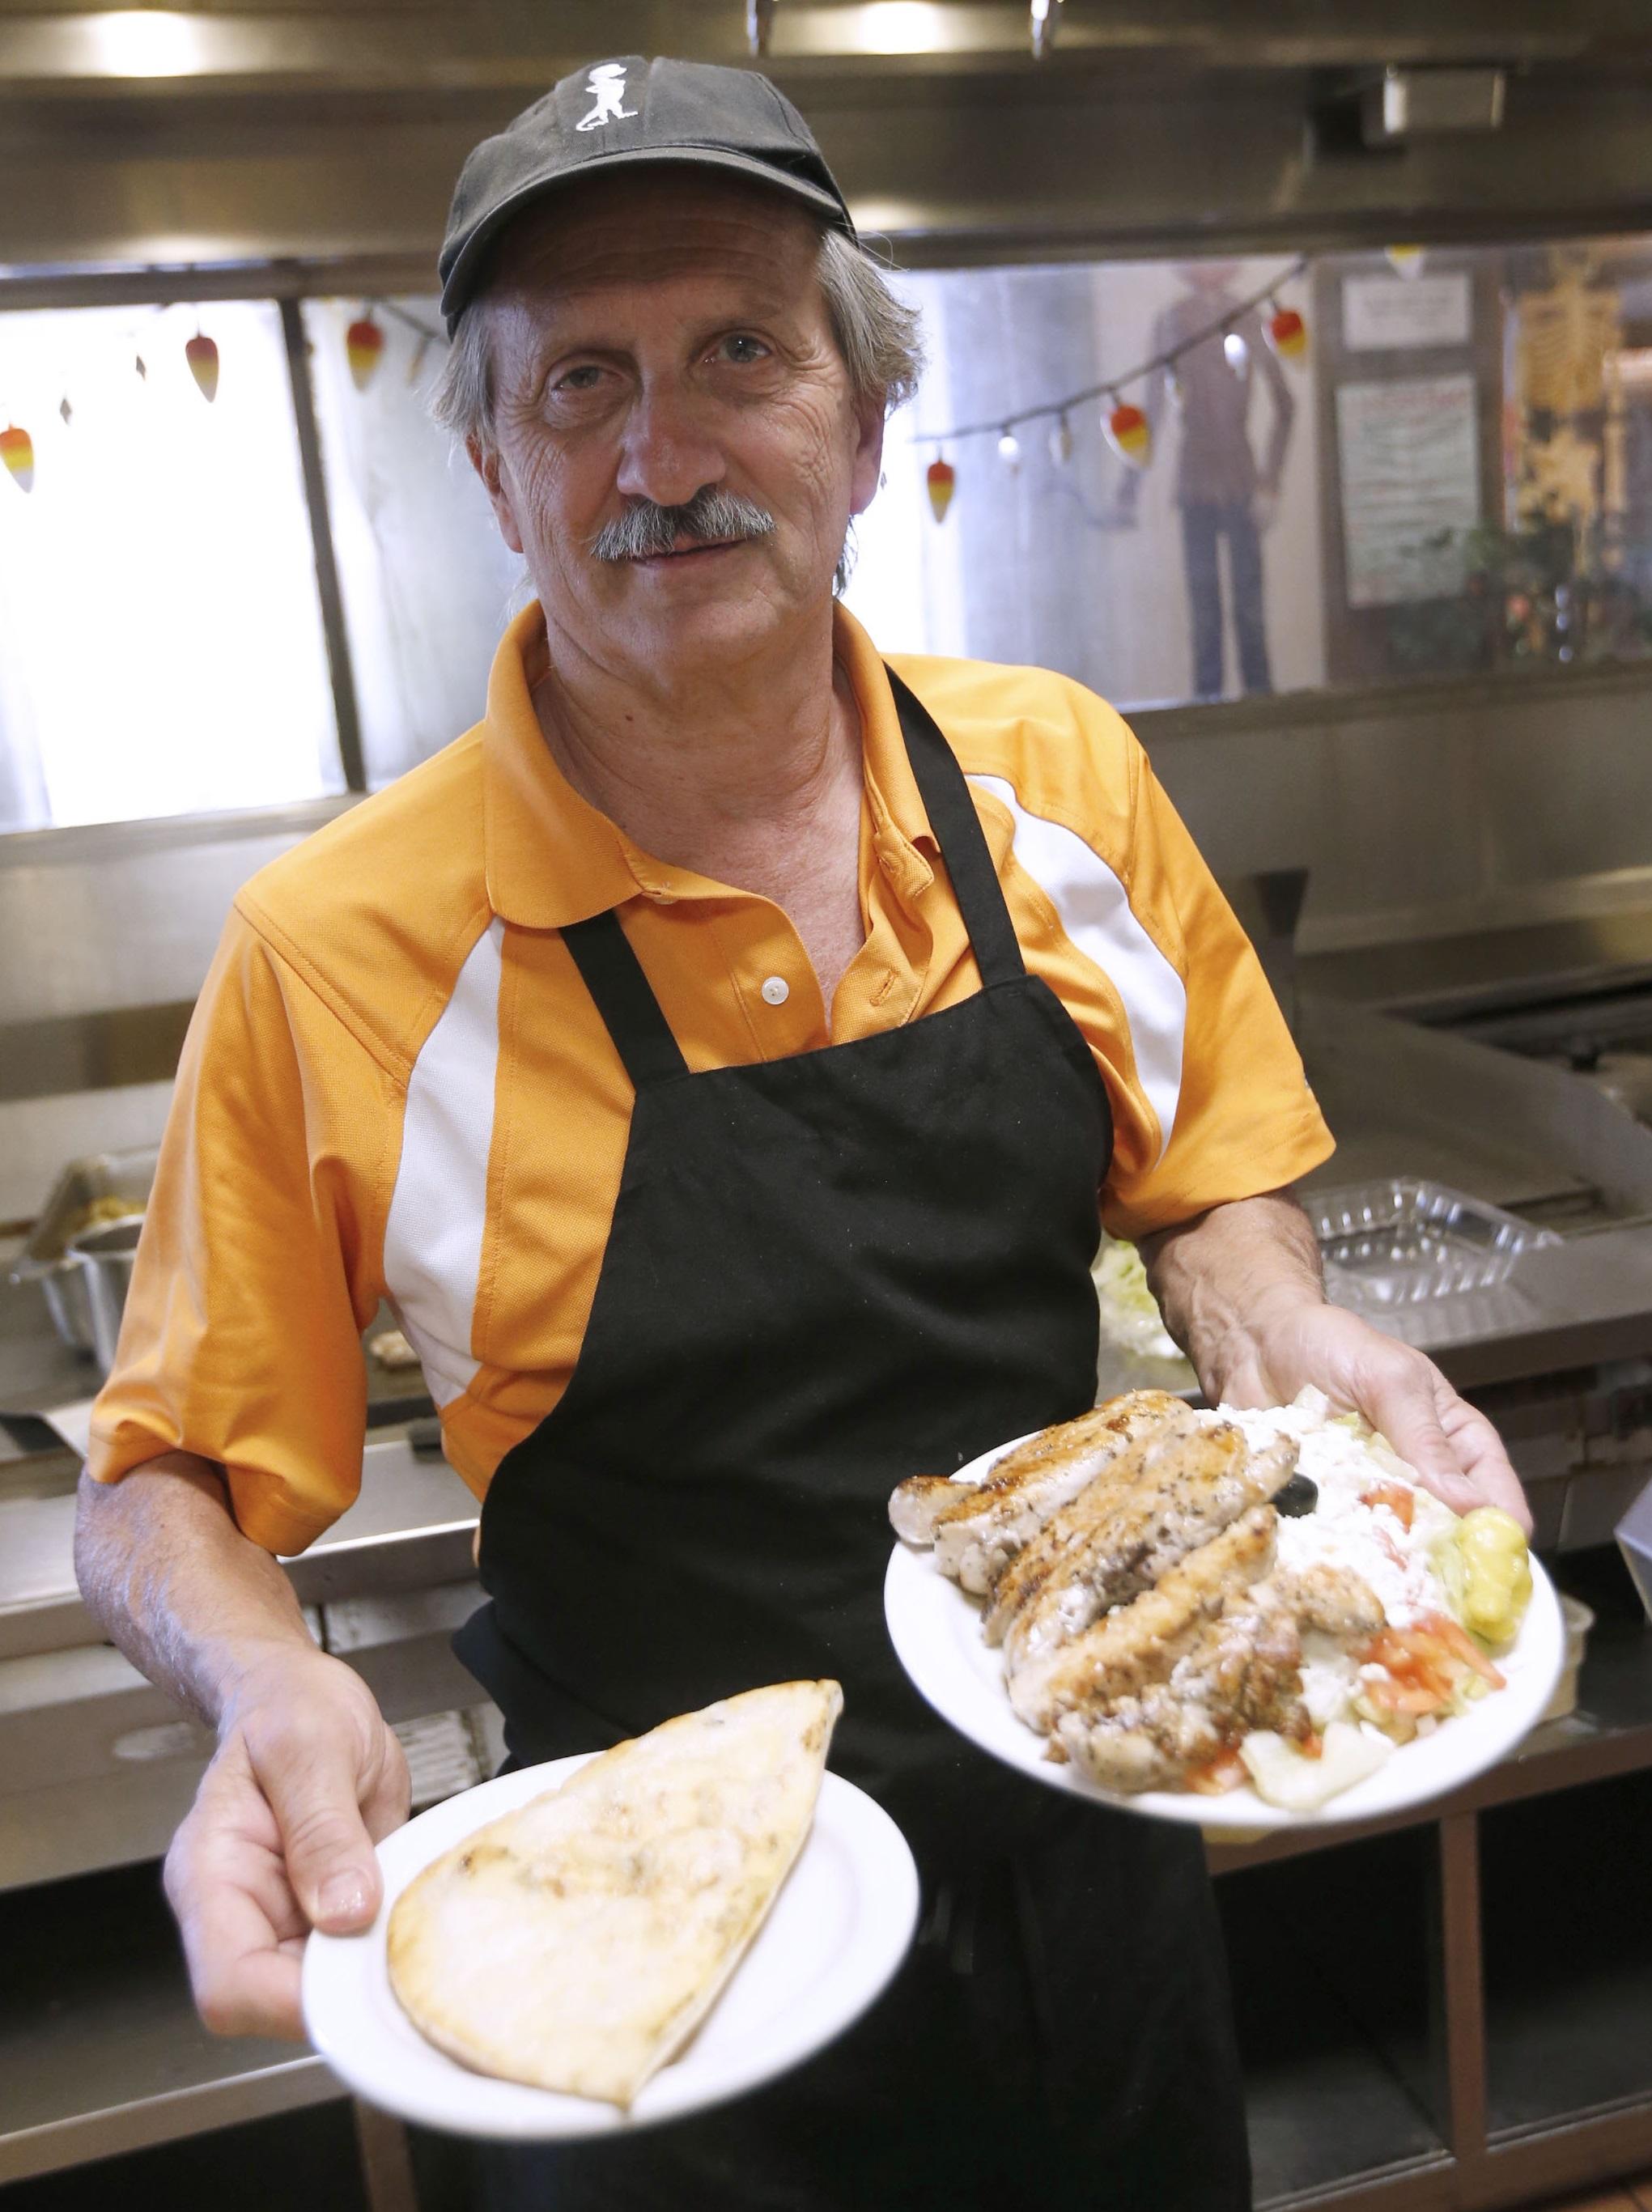 Owner Steve Triantafillou shows off the signature Greek chicken souvlaki at the Seneca Towne restaurant in West Seneca. (Robert Kirkham/Buffalo News)